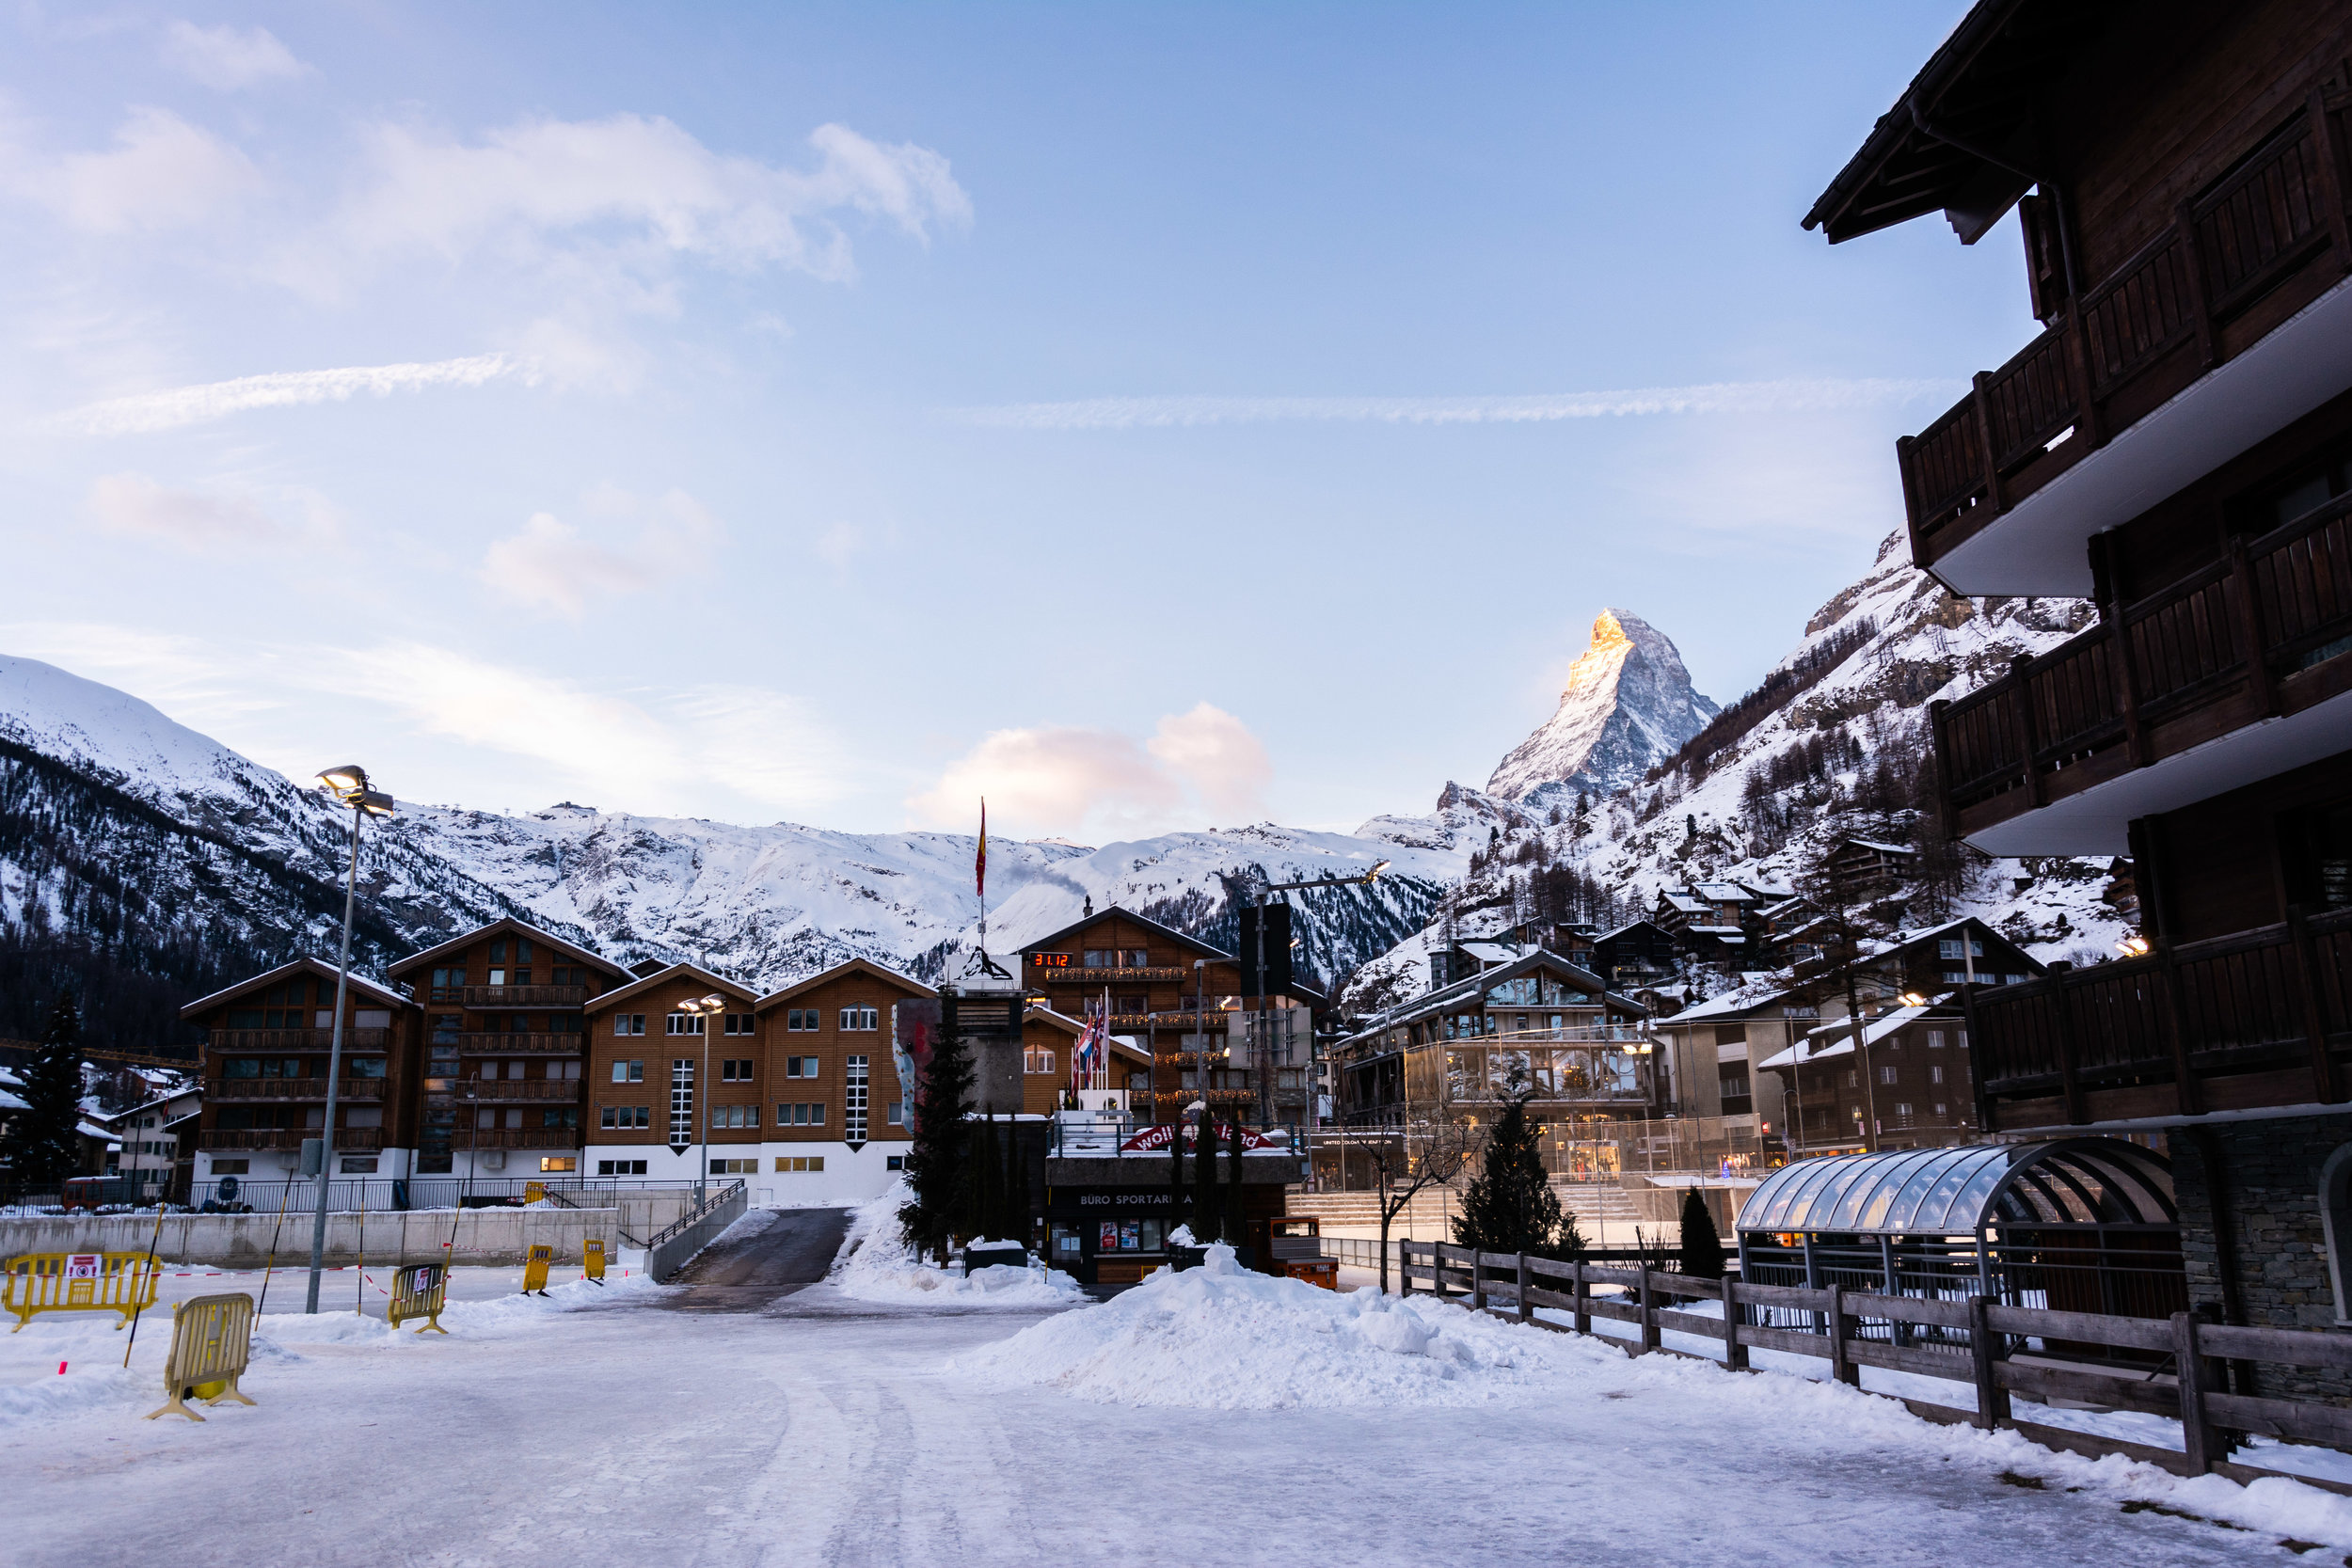 Zermatt at 8:20AM